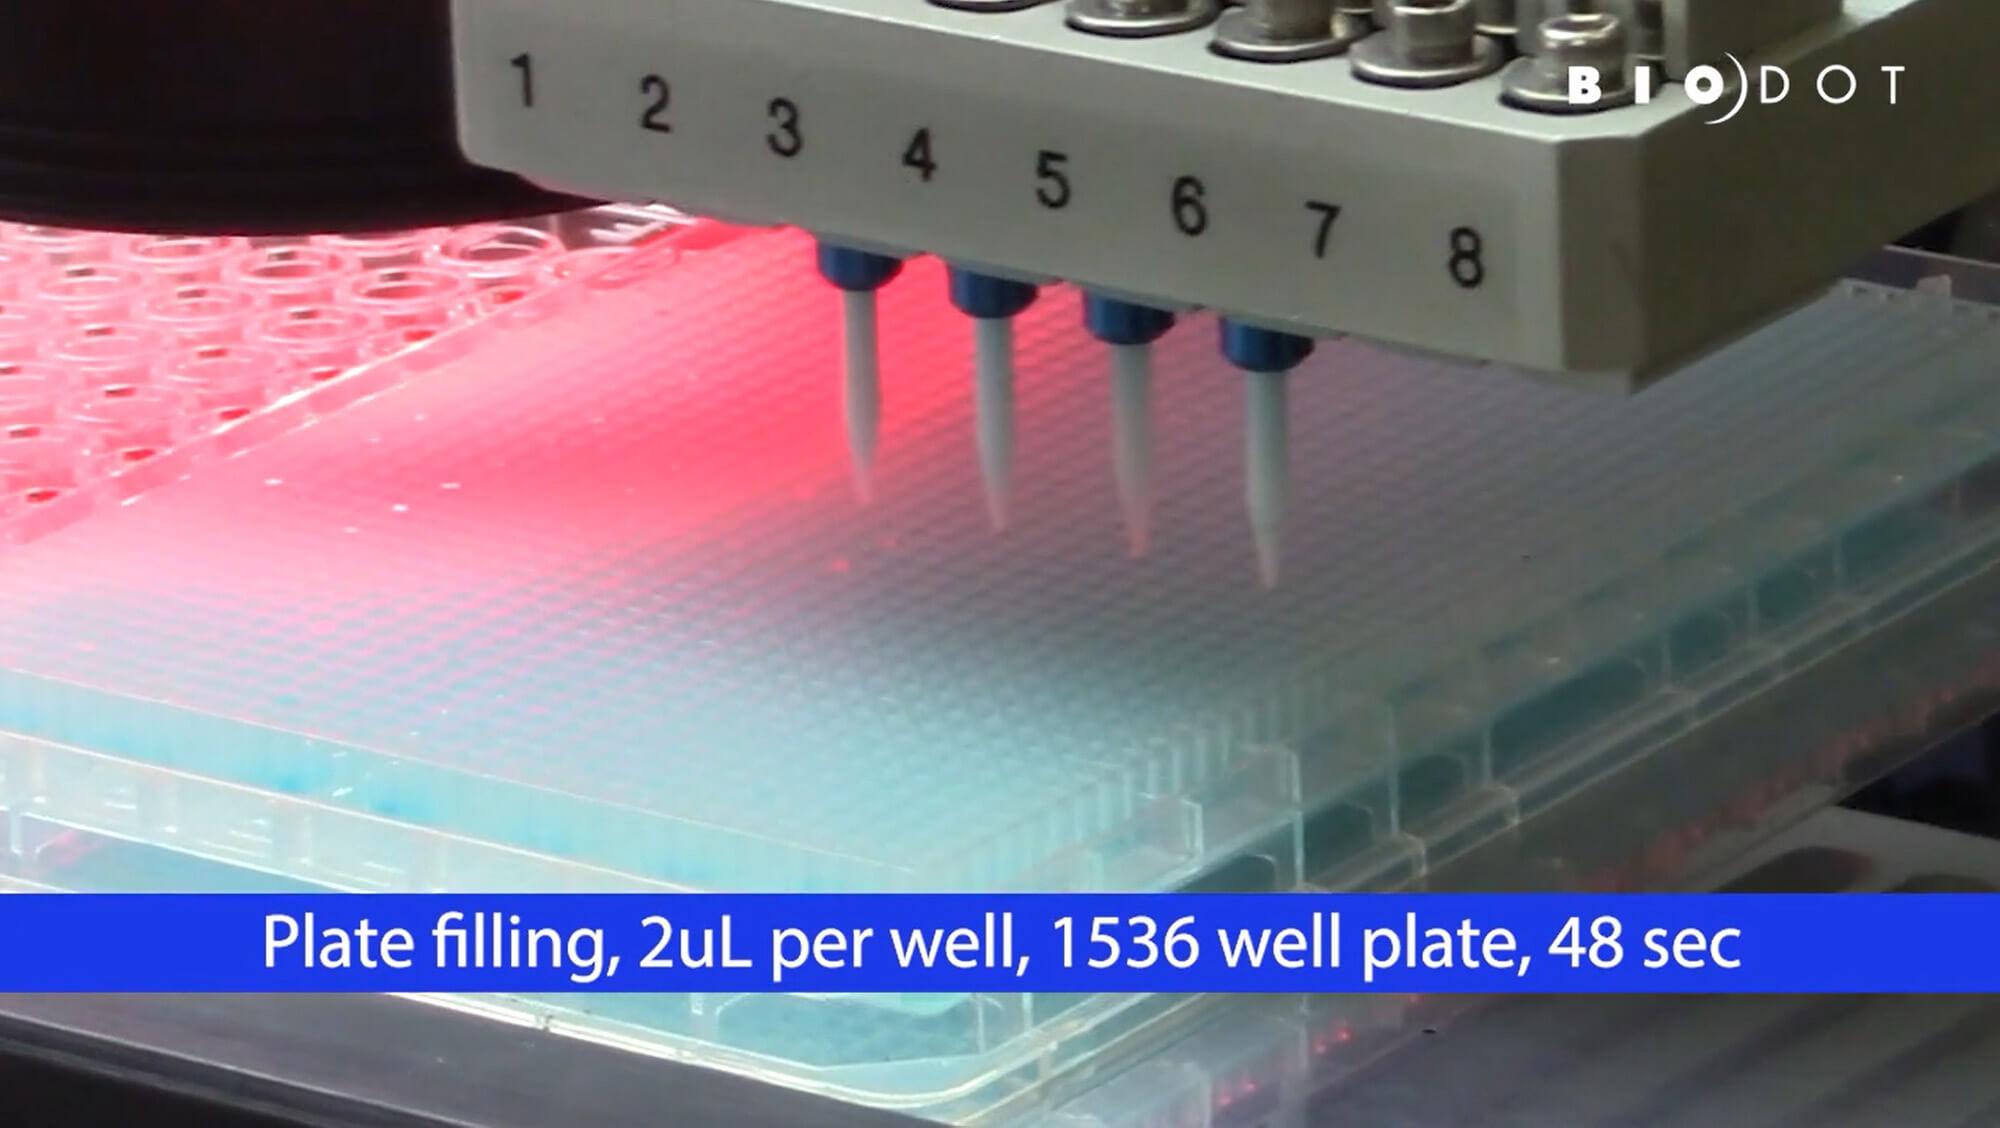 BioDot Dispensing Technologies